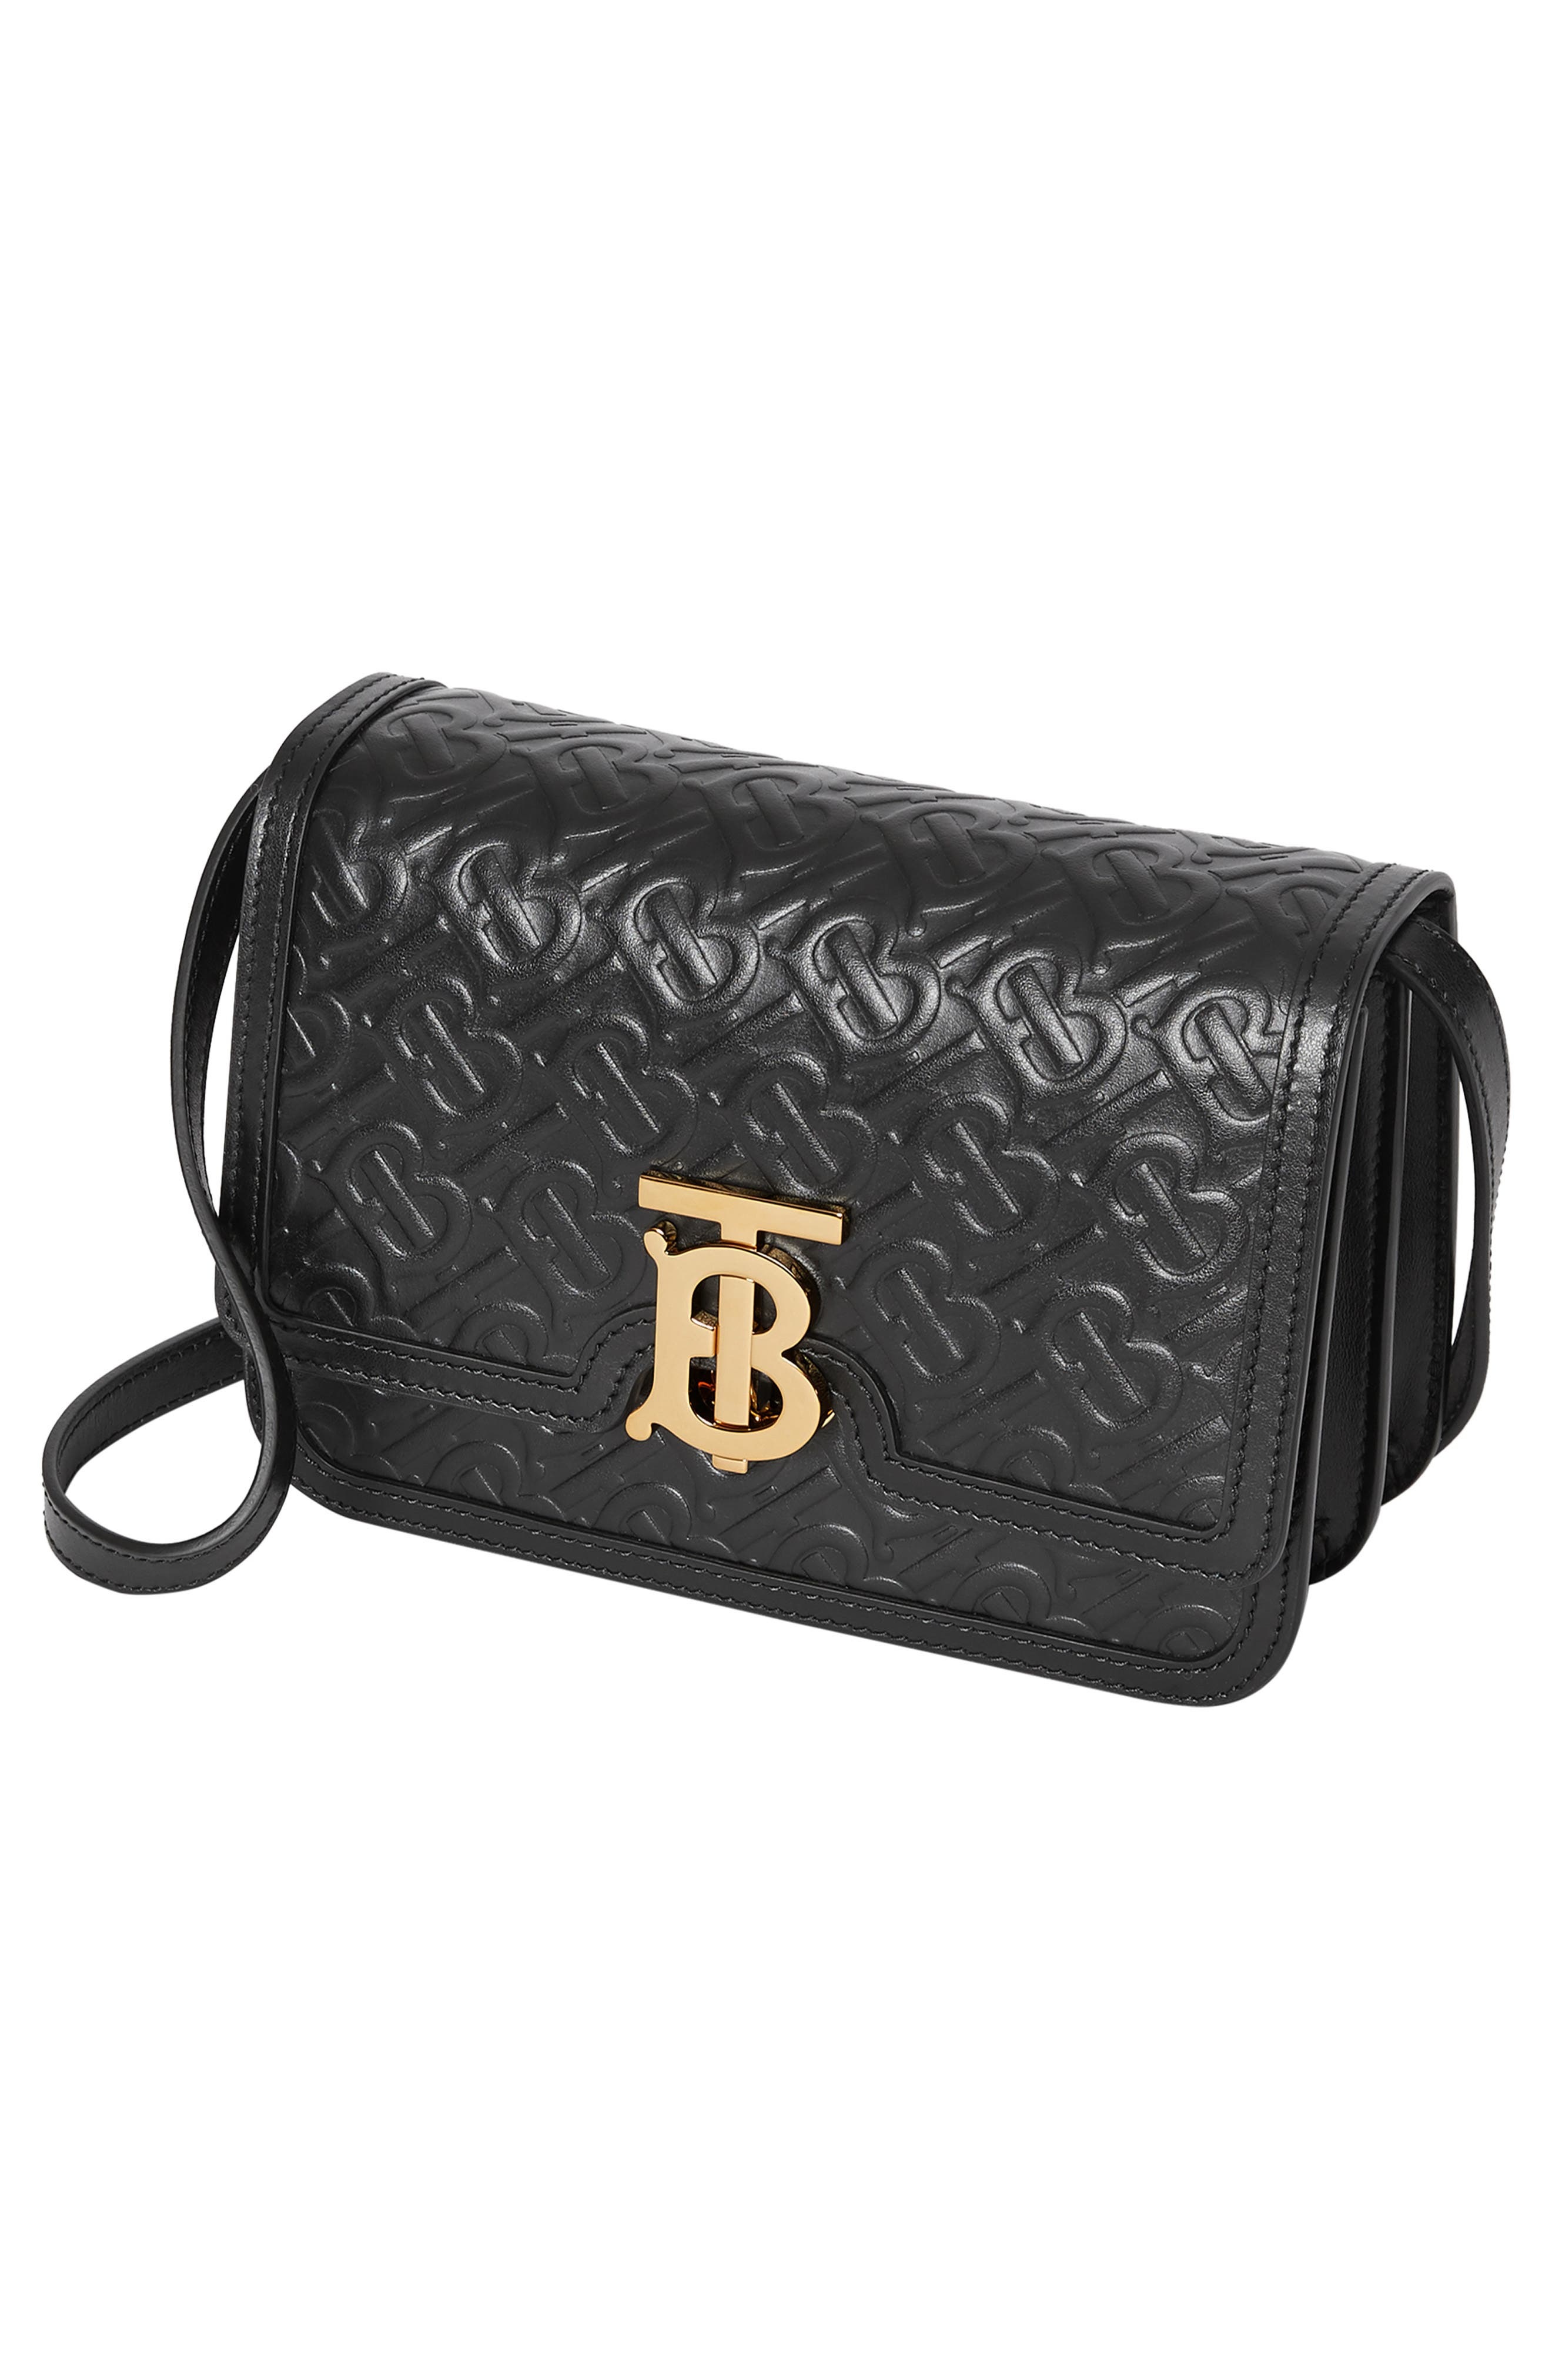 BURBERRY,                             Small Monogram Leather TB Bag,                             Alternate thumbnail 4, color,                             BLACK